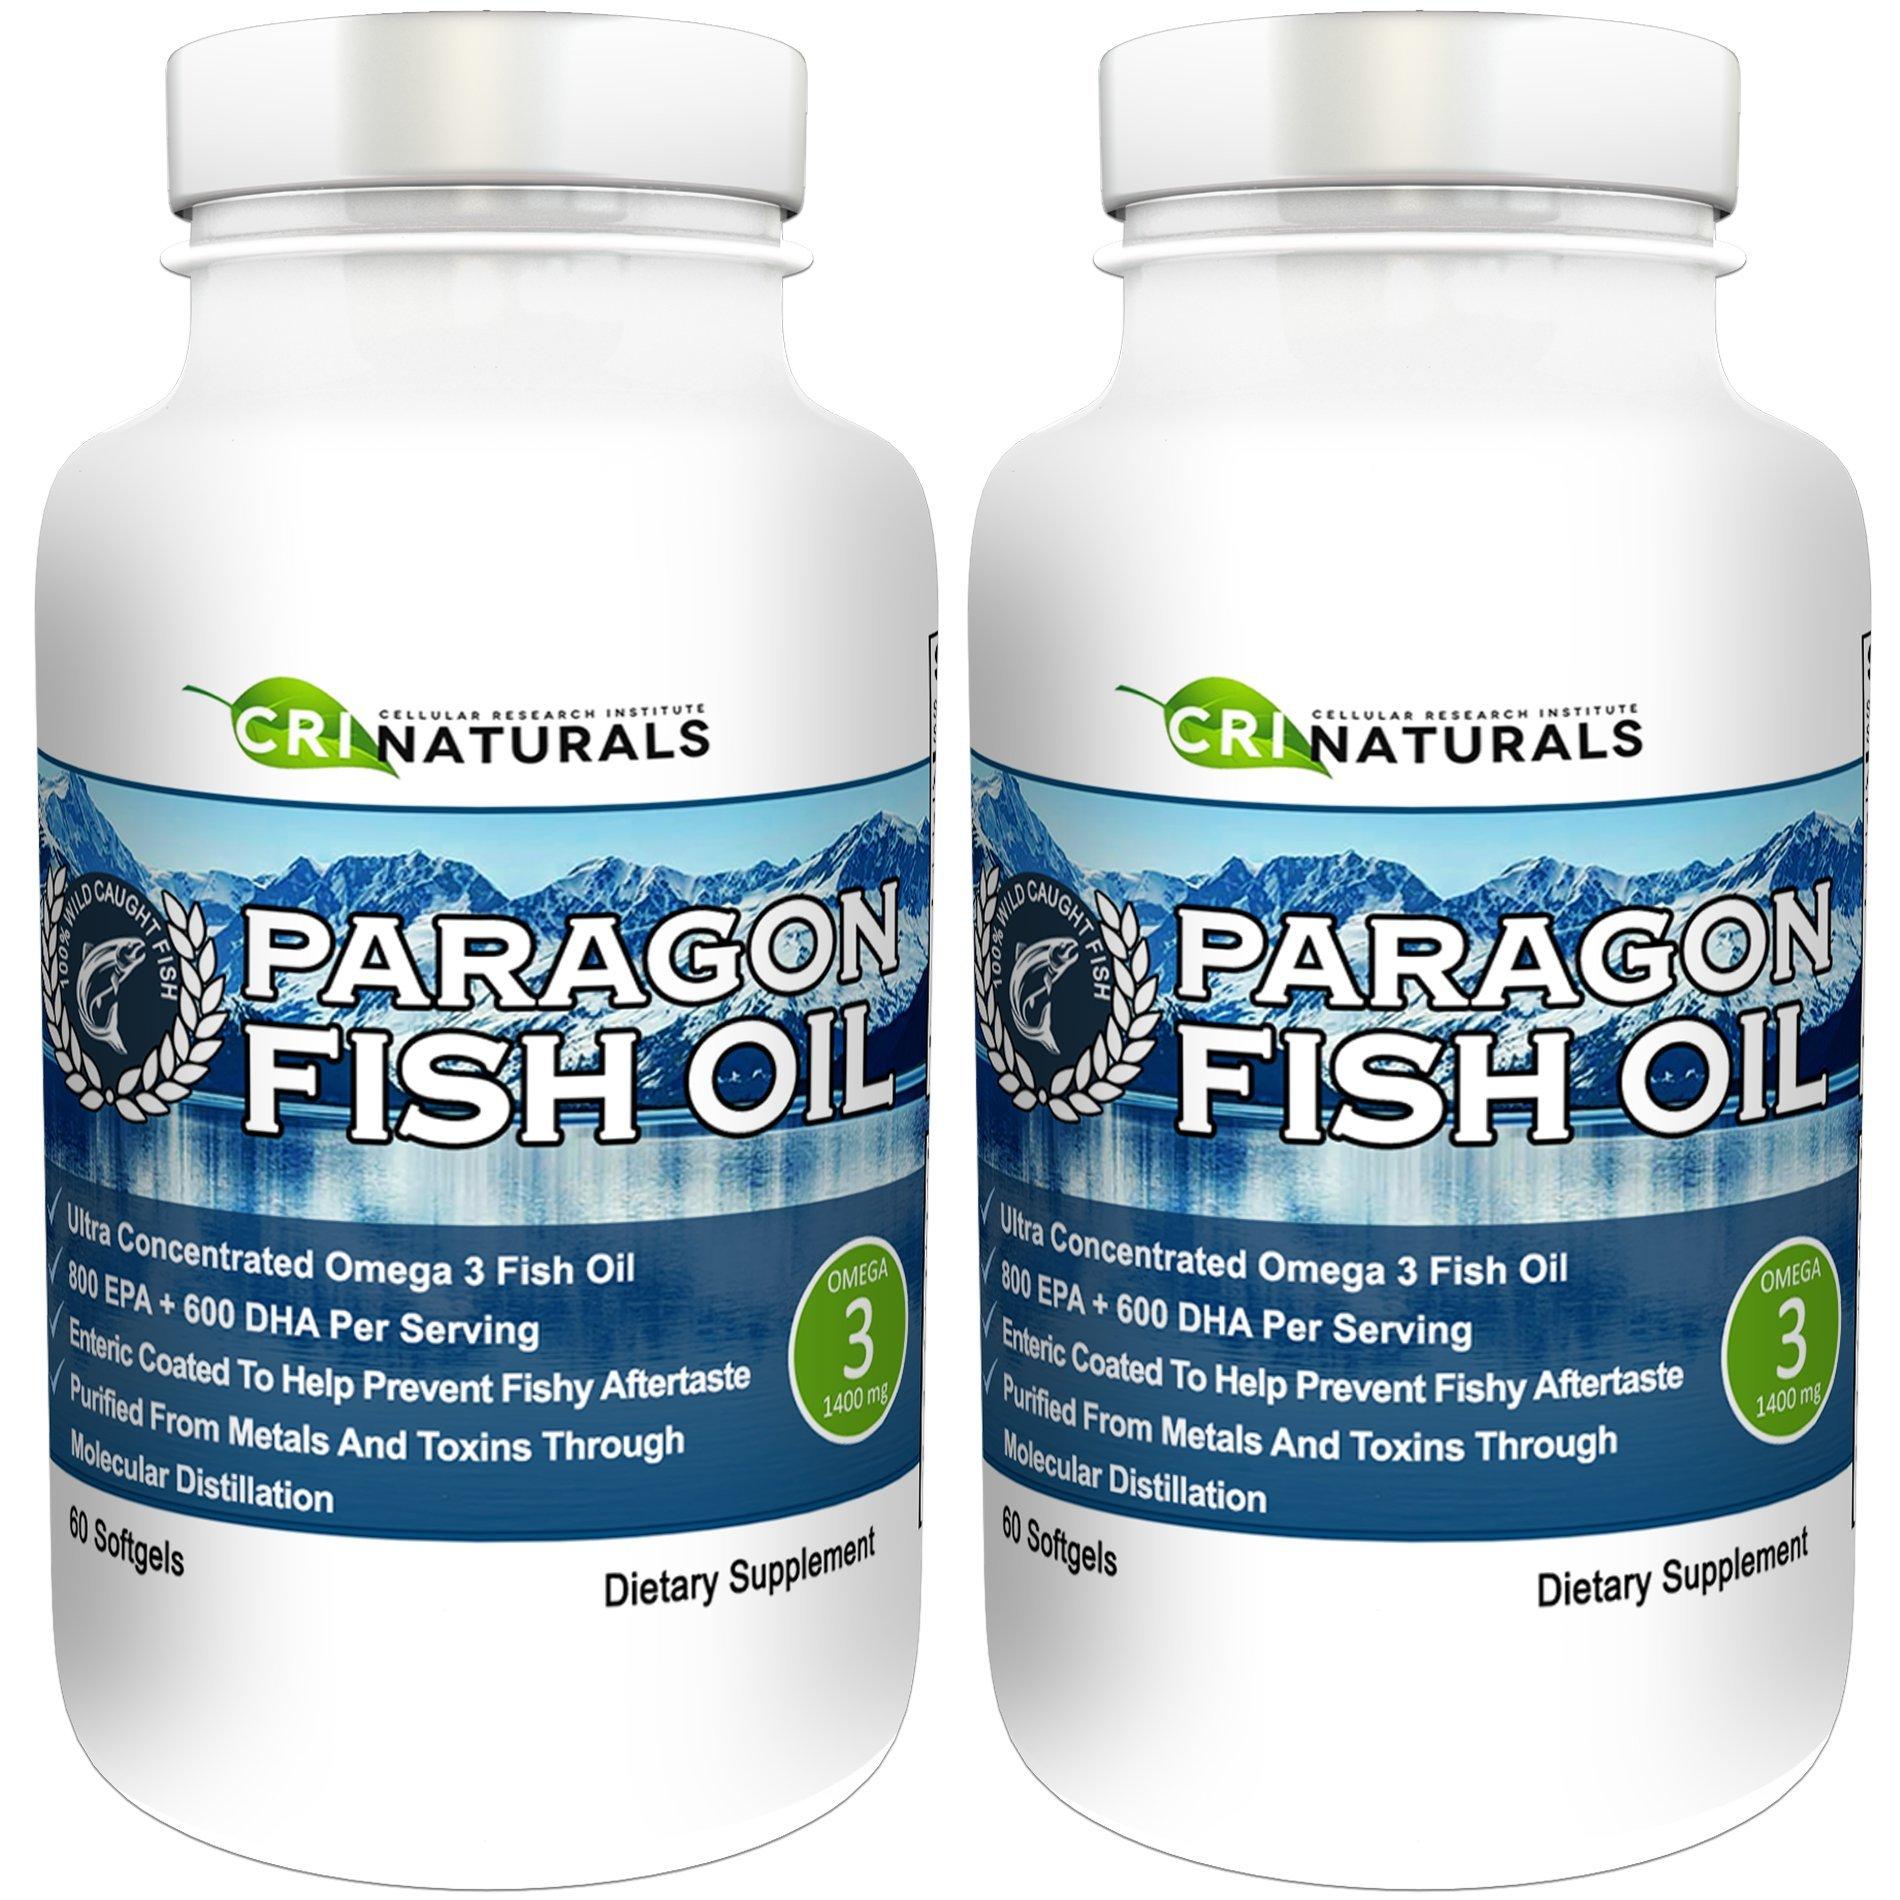 Paragon Fish Oil - Purest - Triple Strength - Omega 3 Fish Oil - Burpless - Highest - EPA + DHA (2 Pack)